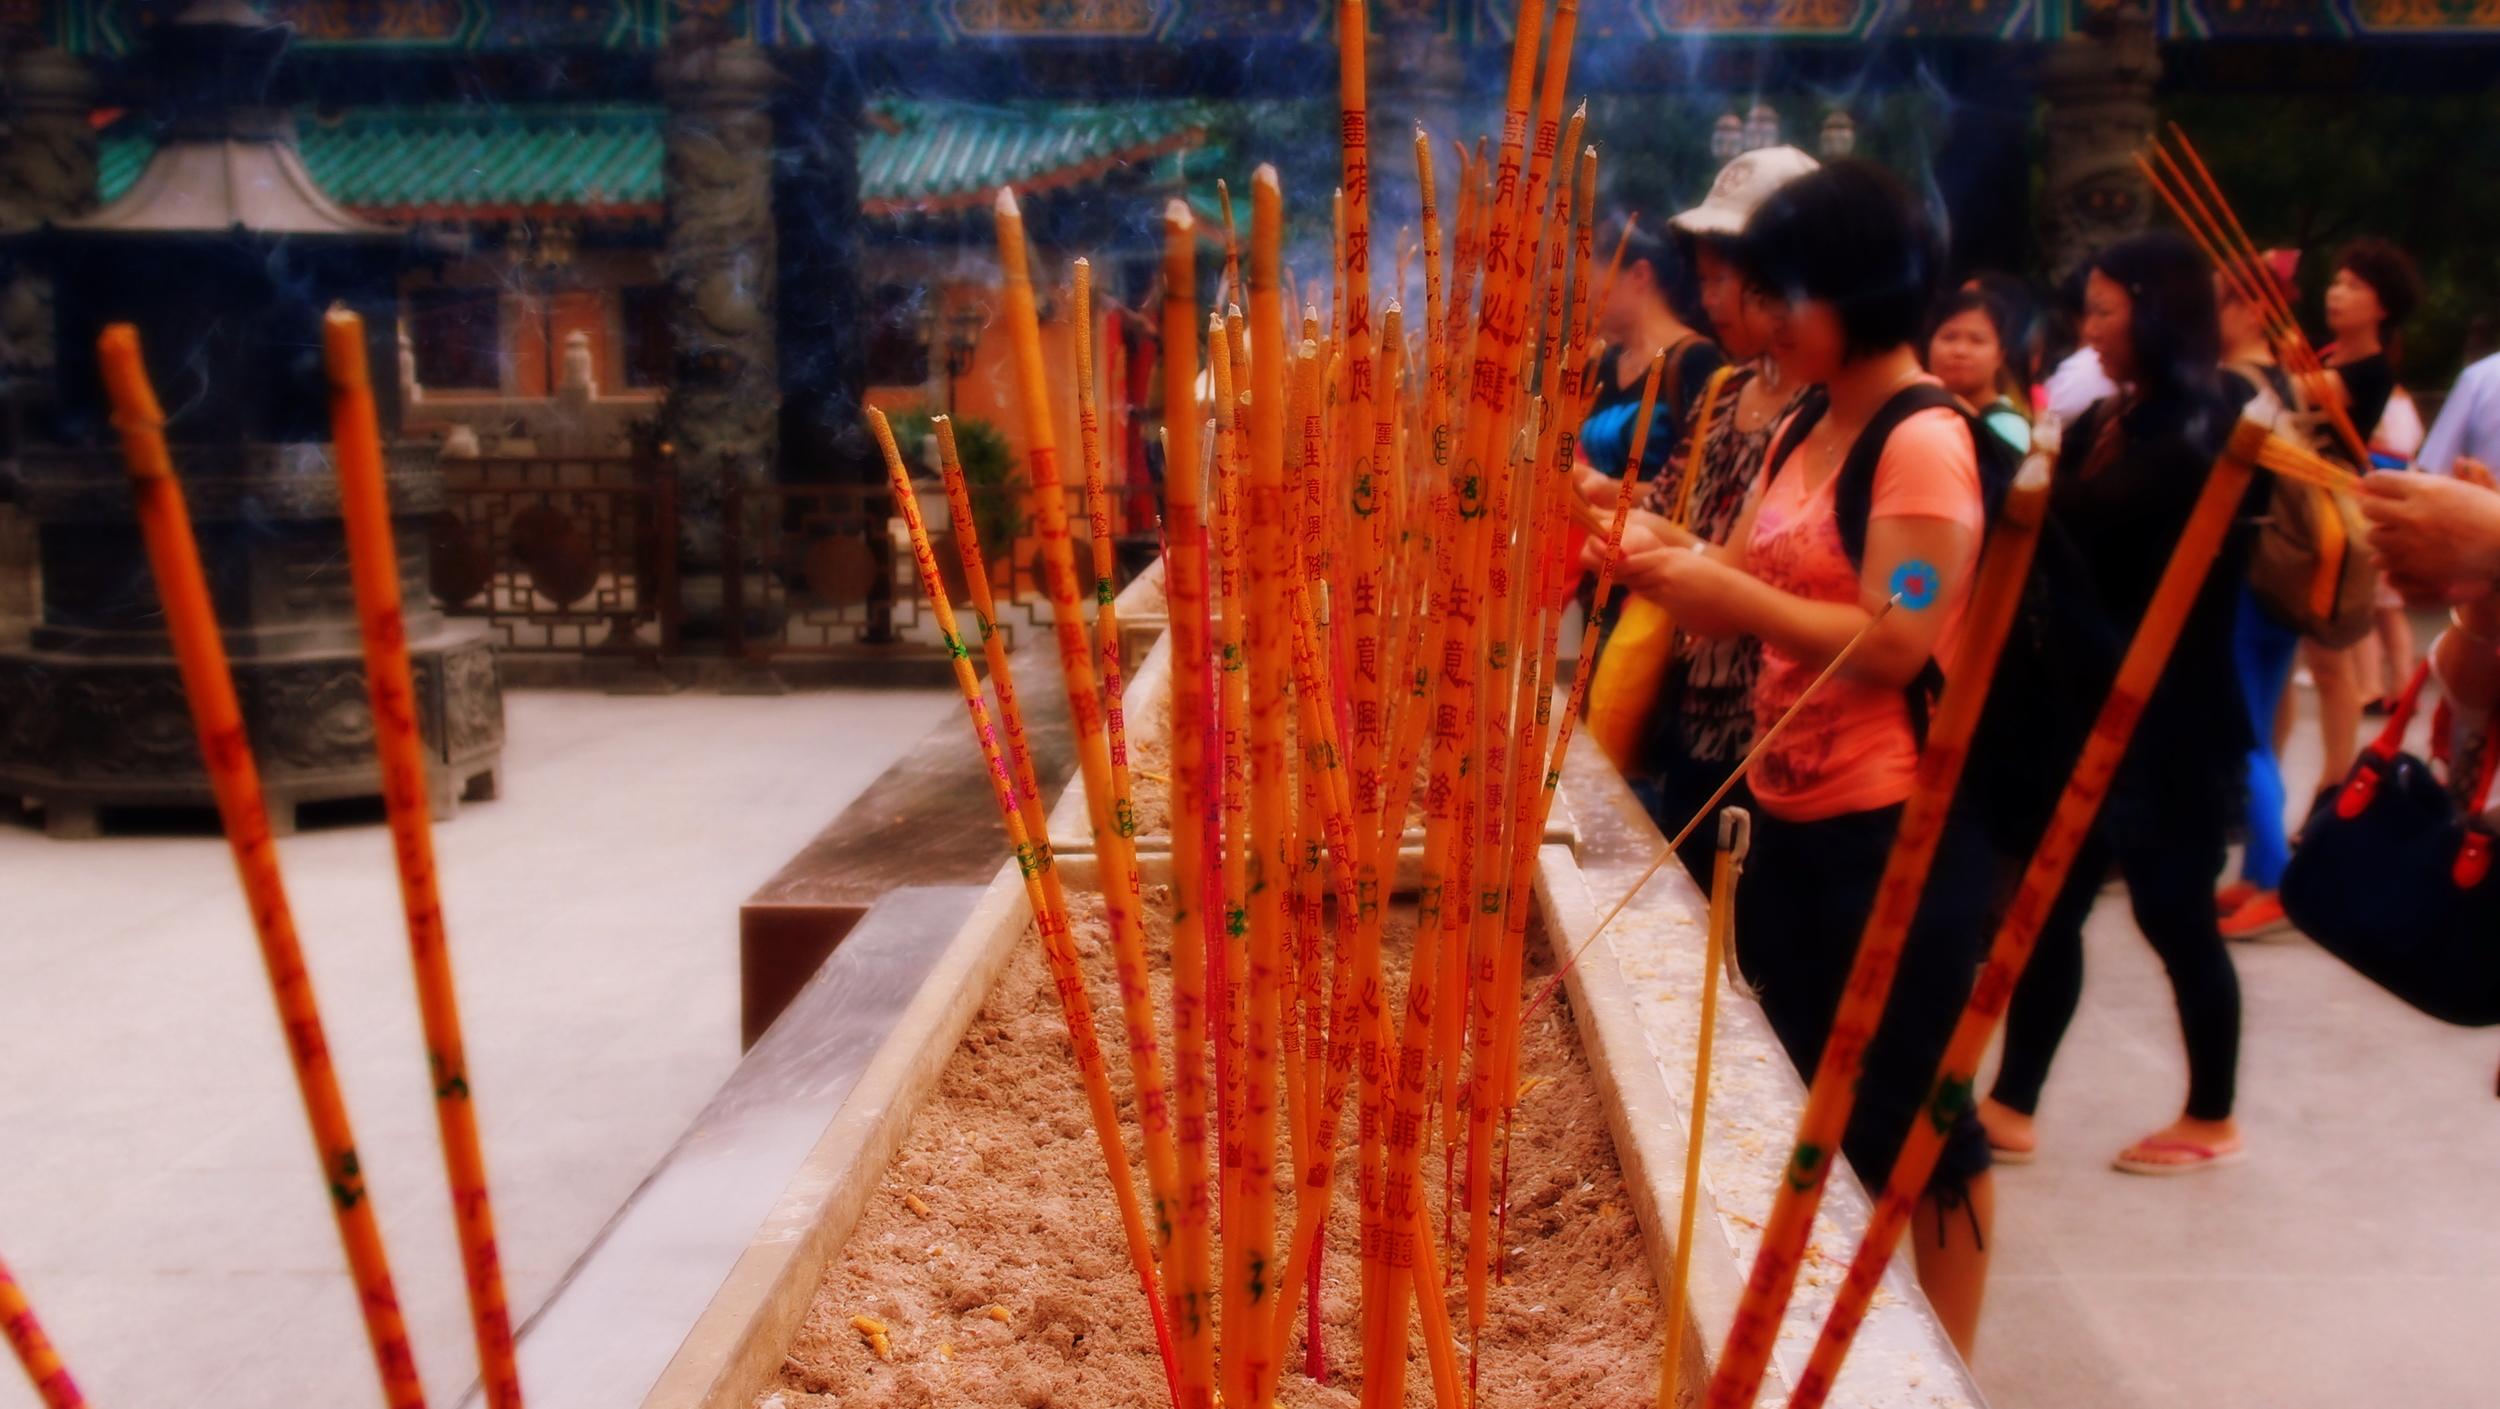 A spot of incense burning at the Sik Sik Yuen Wong Tai Sin Temple